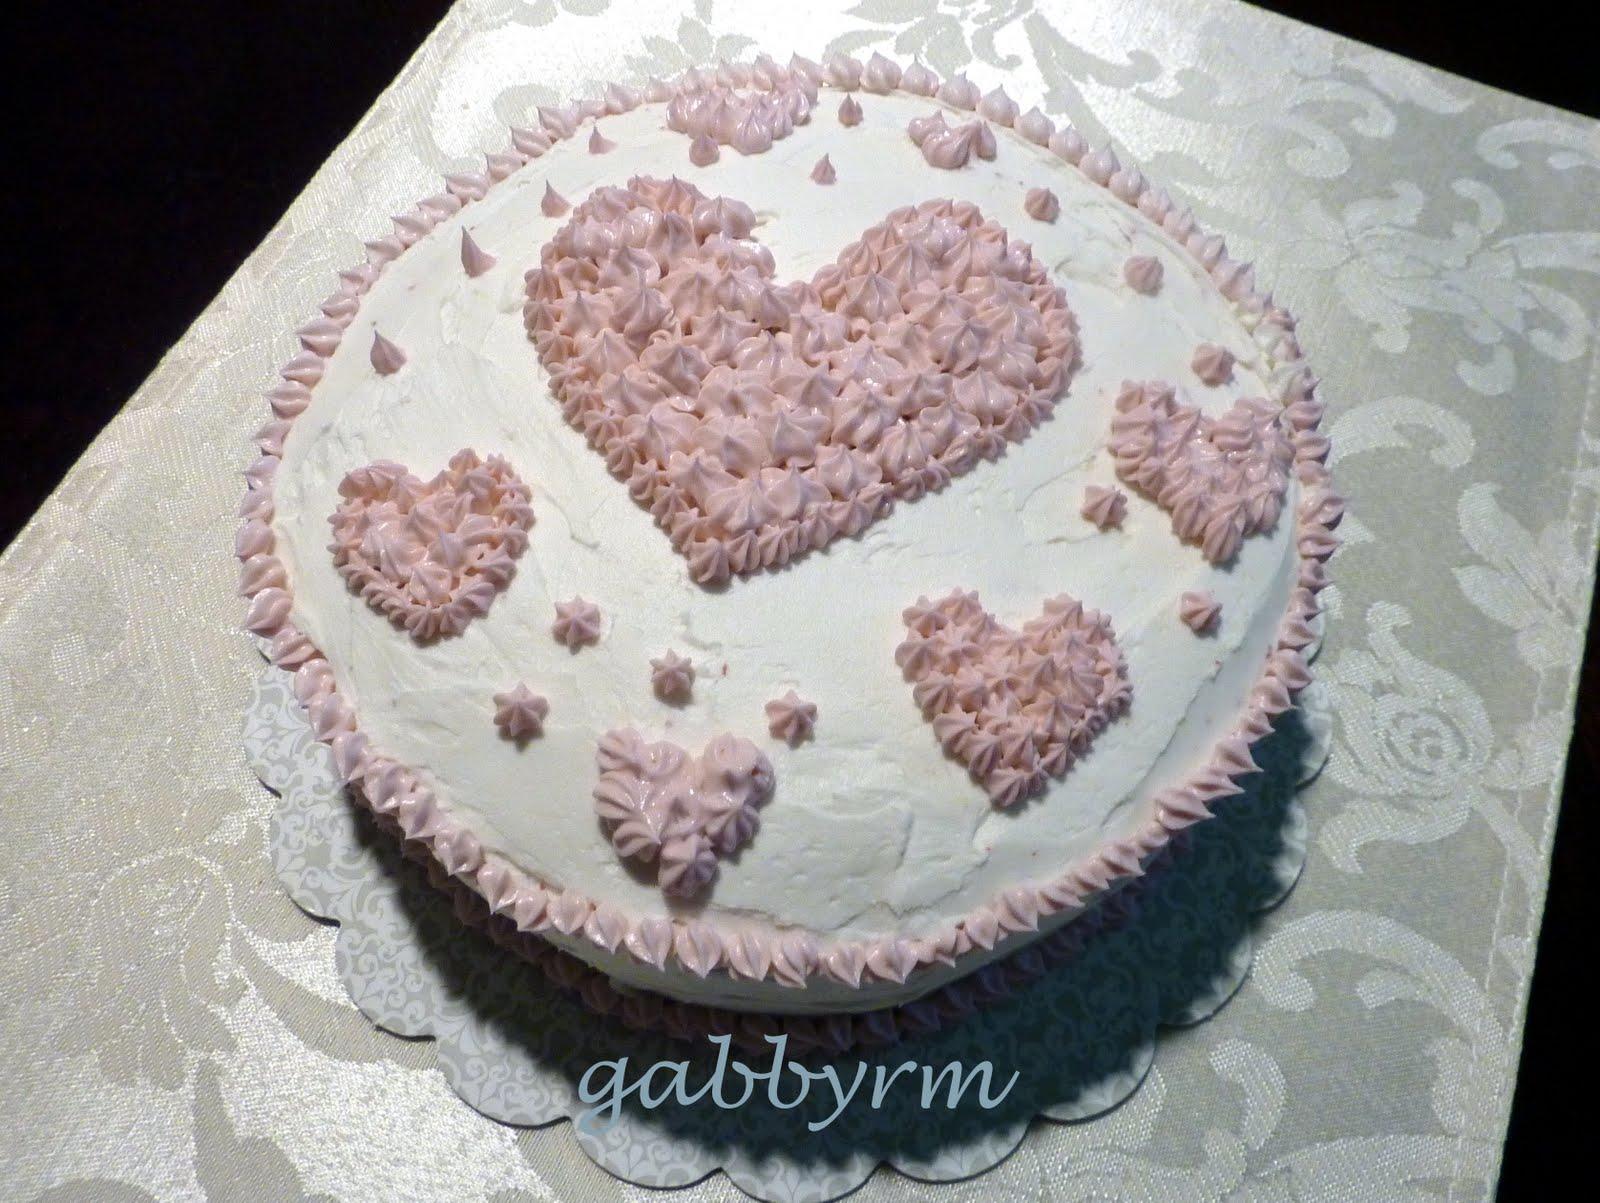 The Wilton Method Of Cake Decorating Course